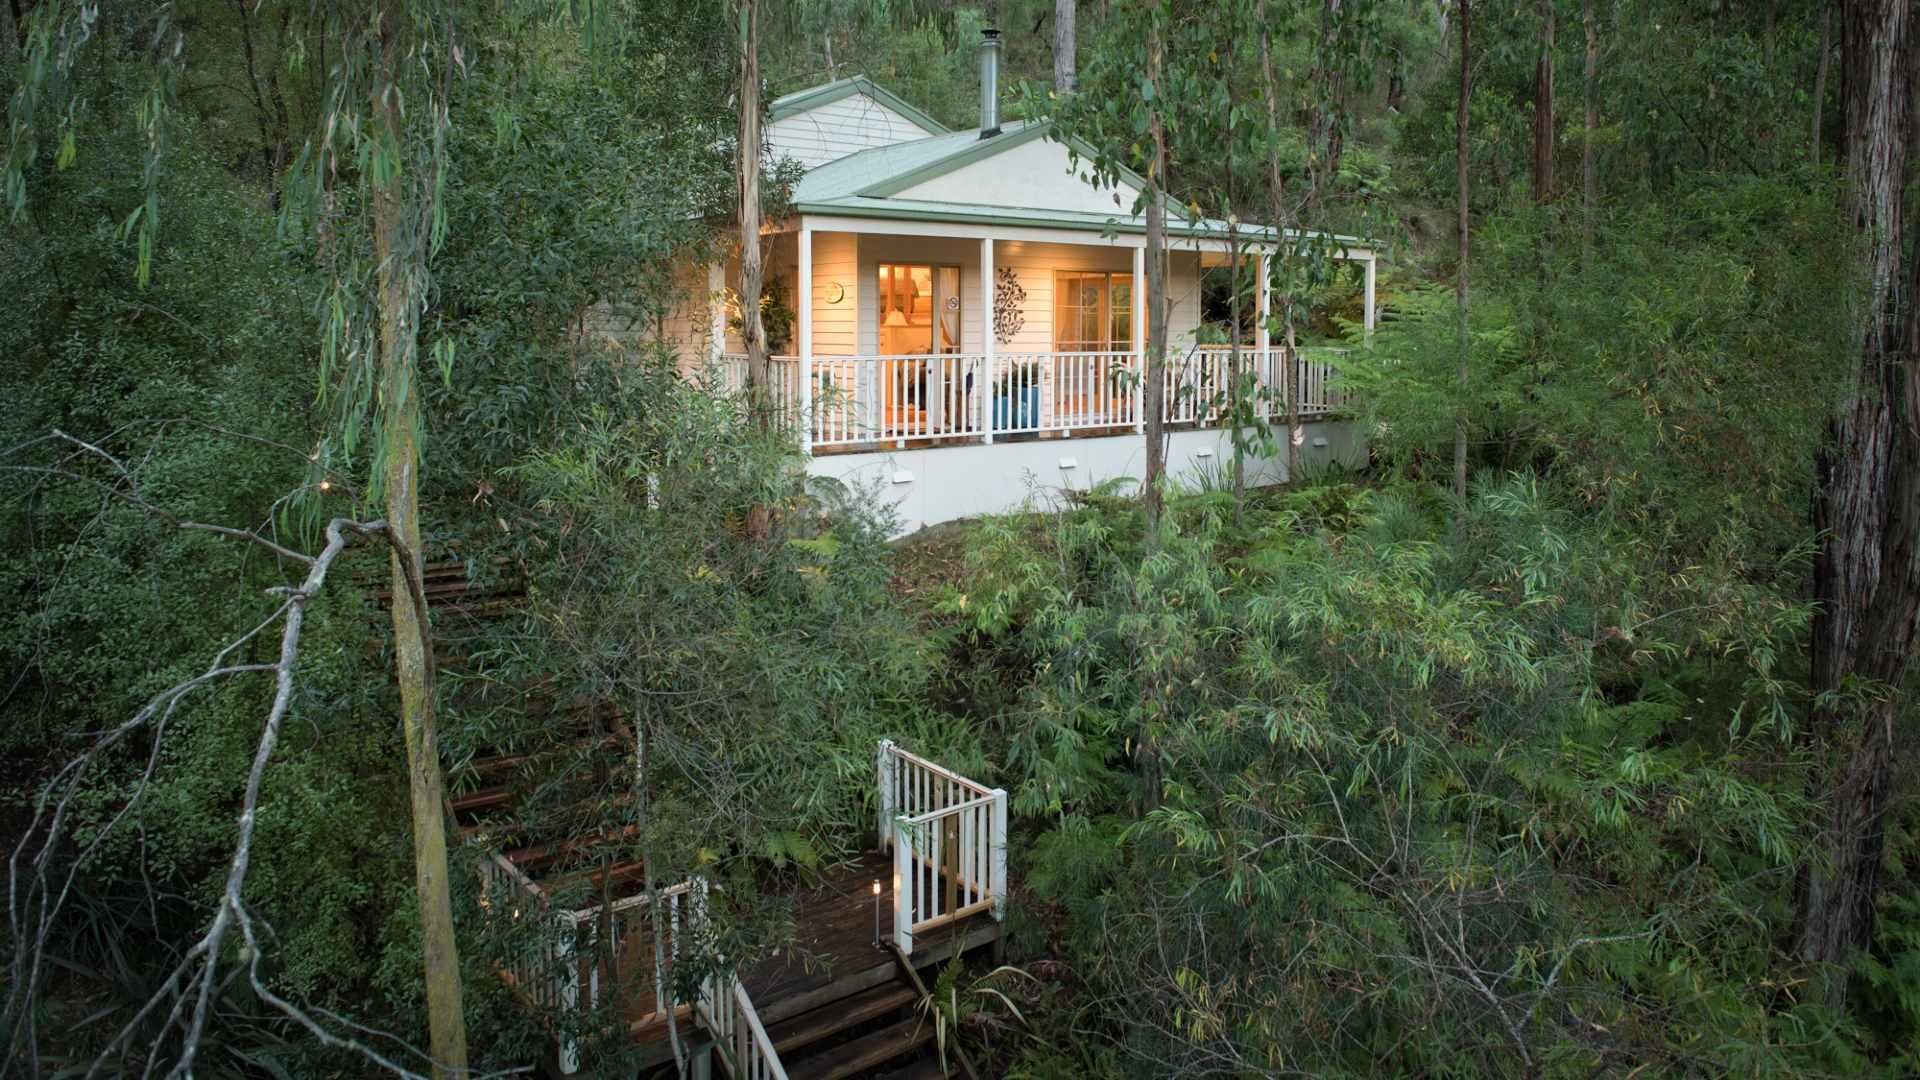 Twenty Lush Getaways You Can Book in the Yarra Valley